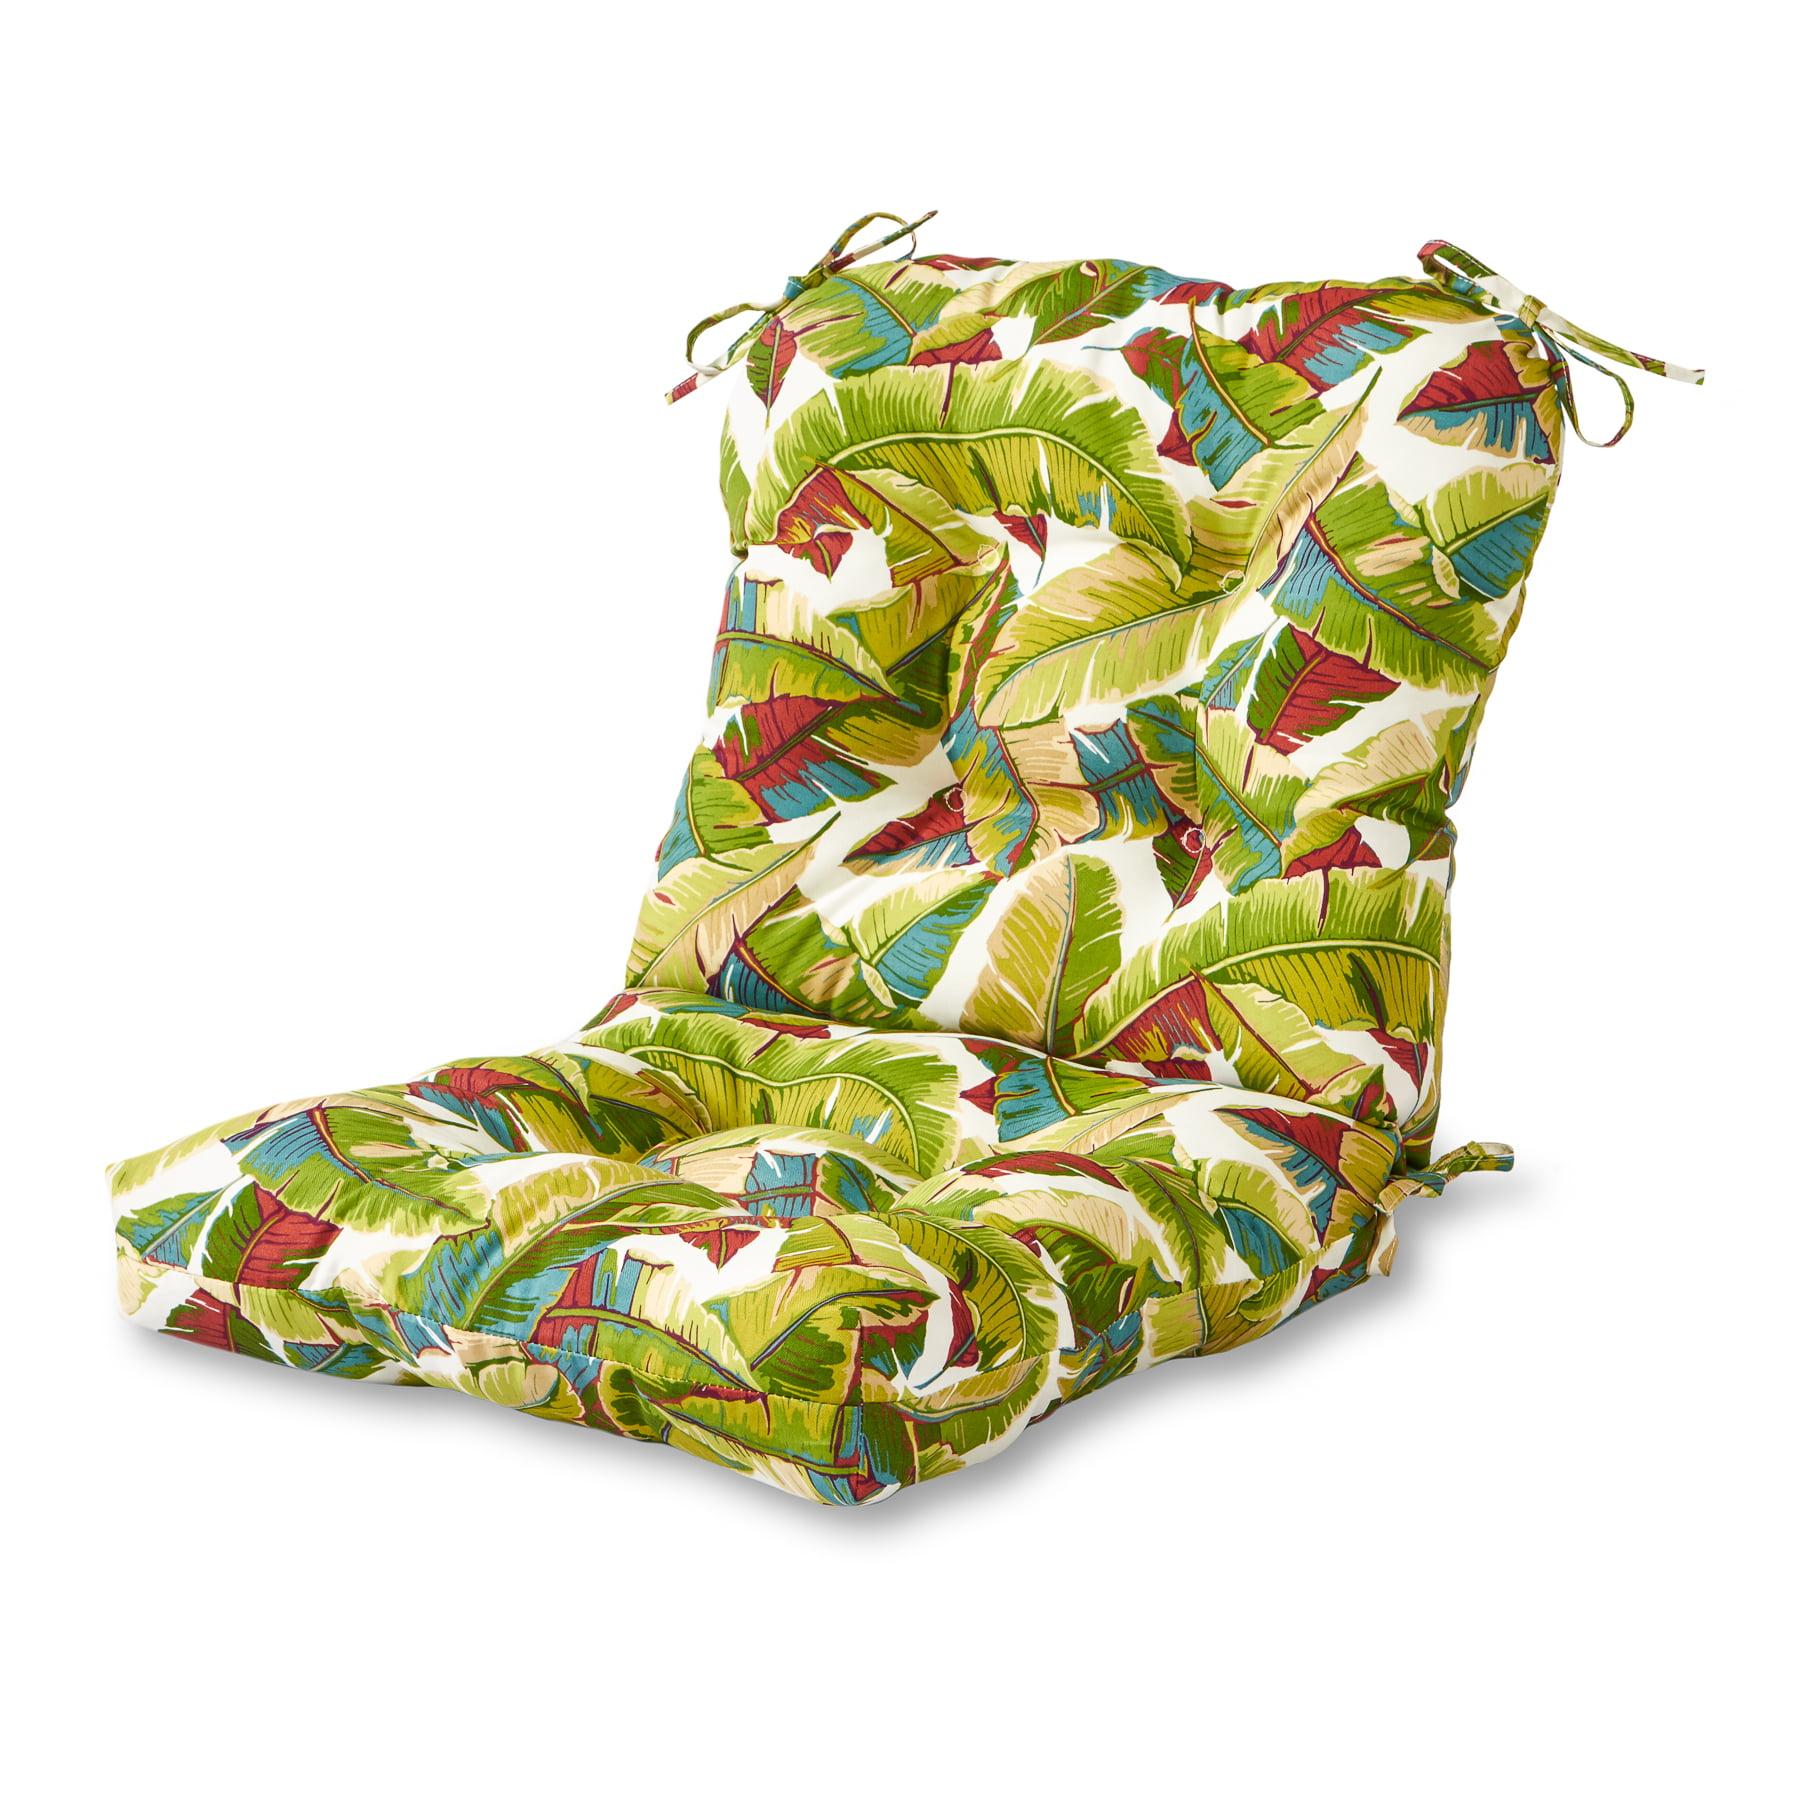 Marlow Outdoor Chair Cushion